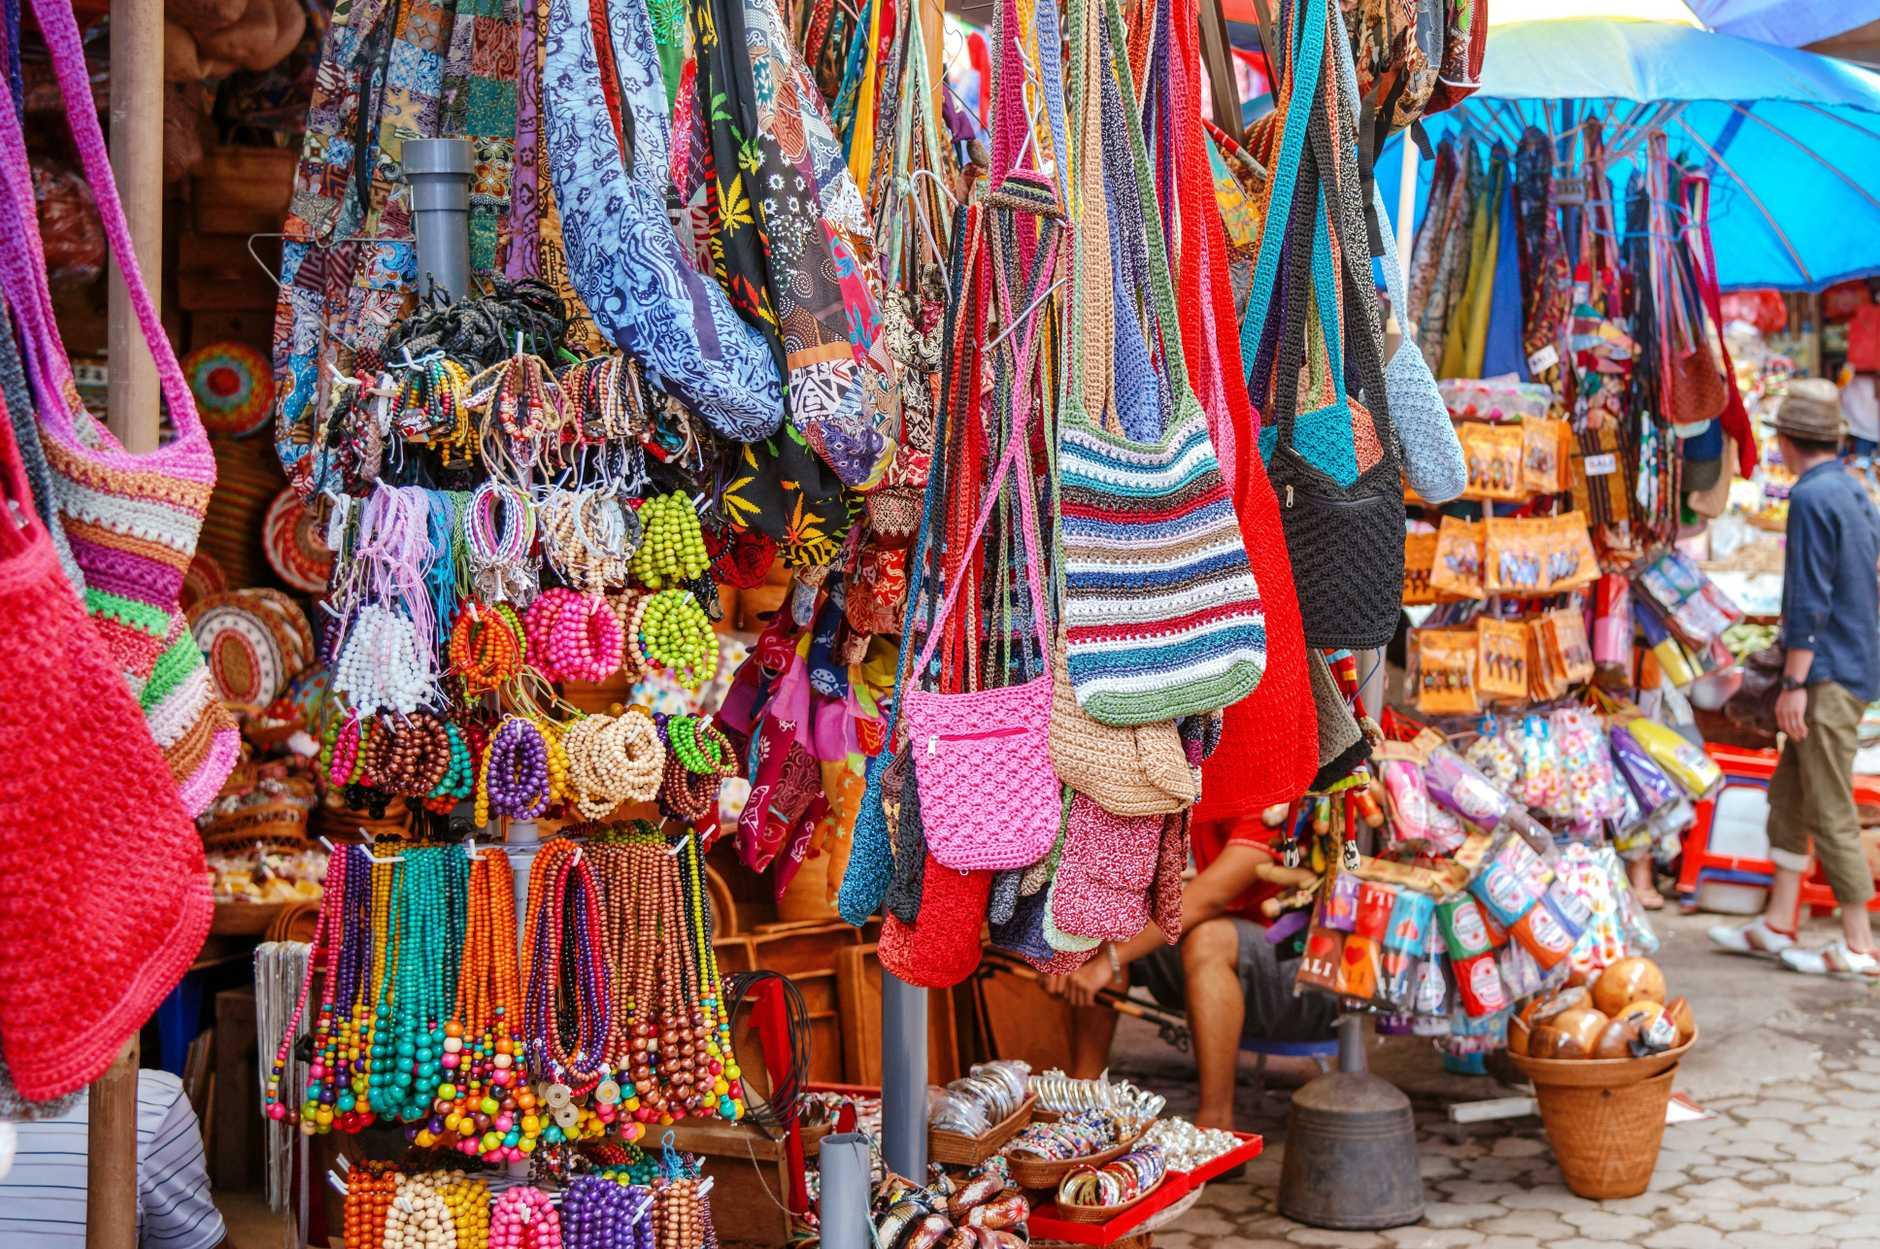 Street Market in Ubud, Bali, Indonesia